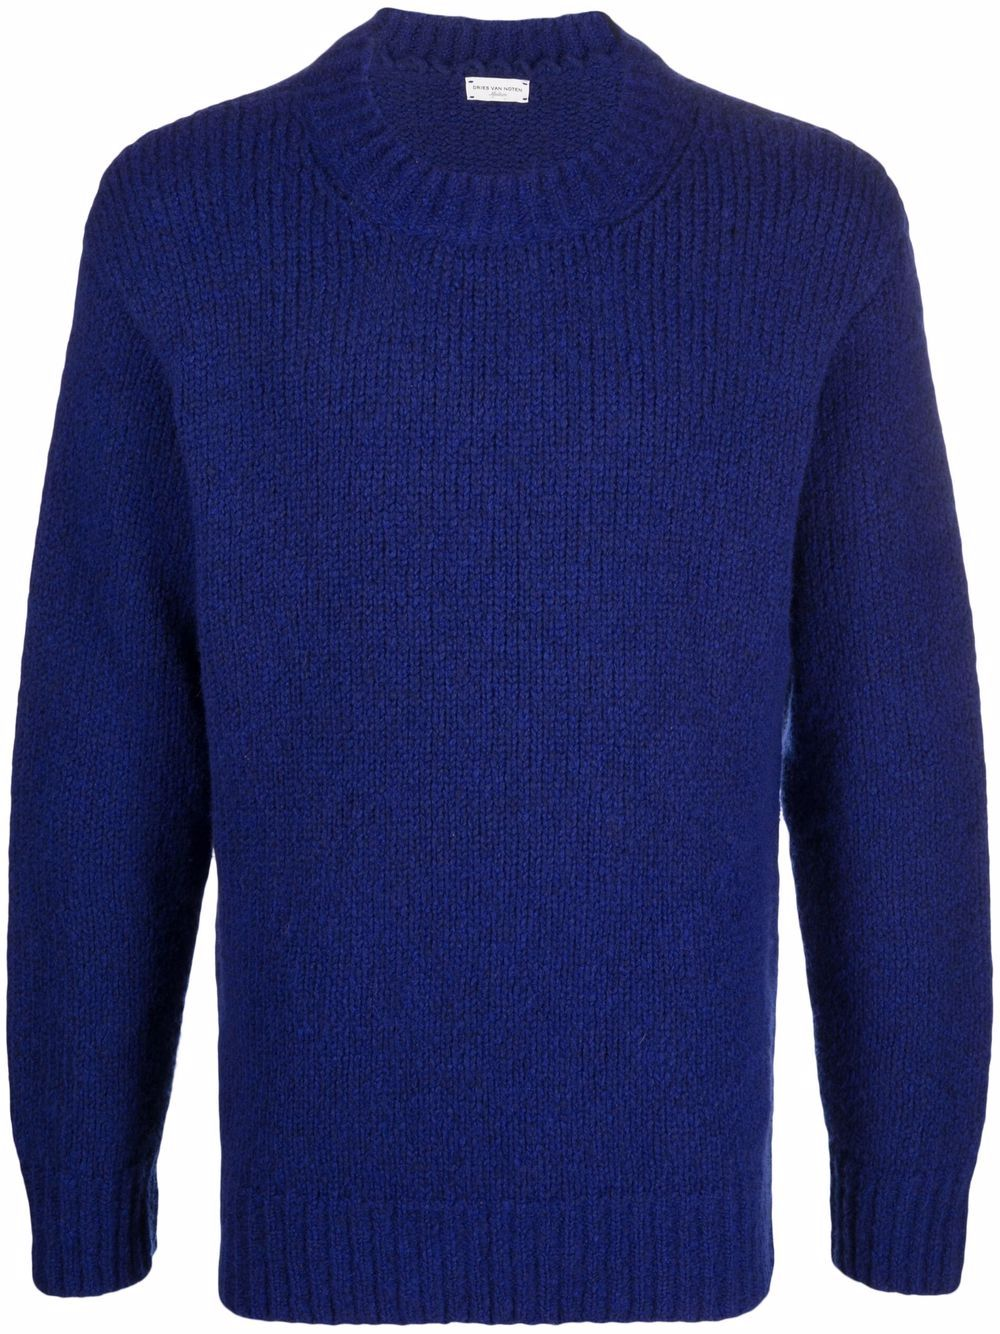 maglione tibbe uomo blu in lana DRIES VAN NOTEN   Maglieria   TIBBE 3705512